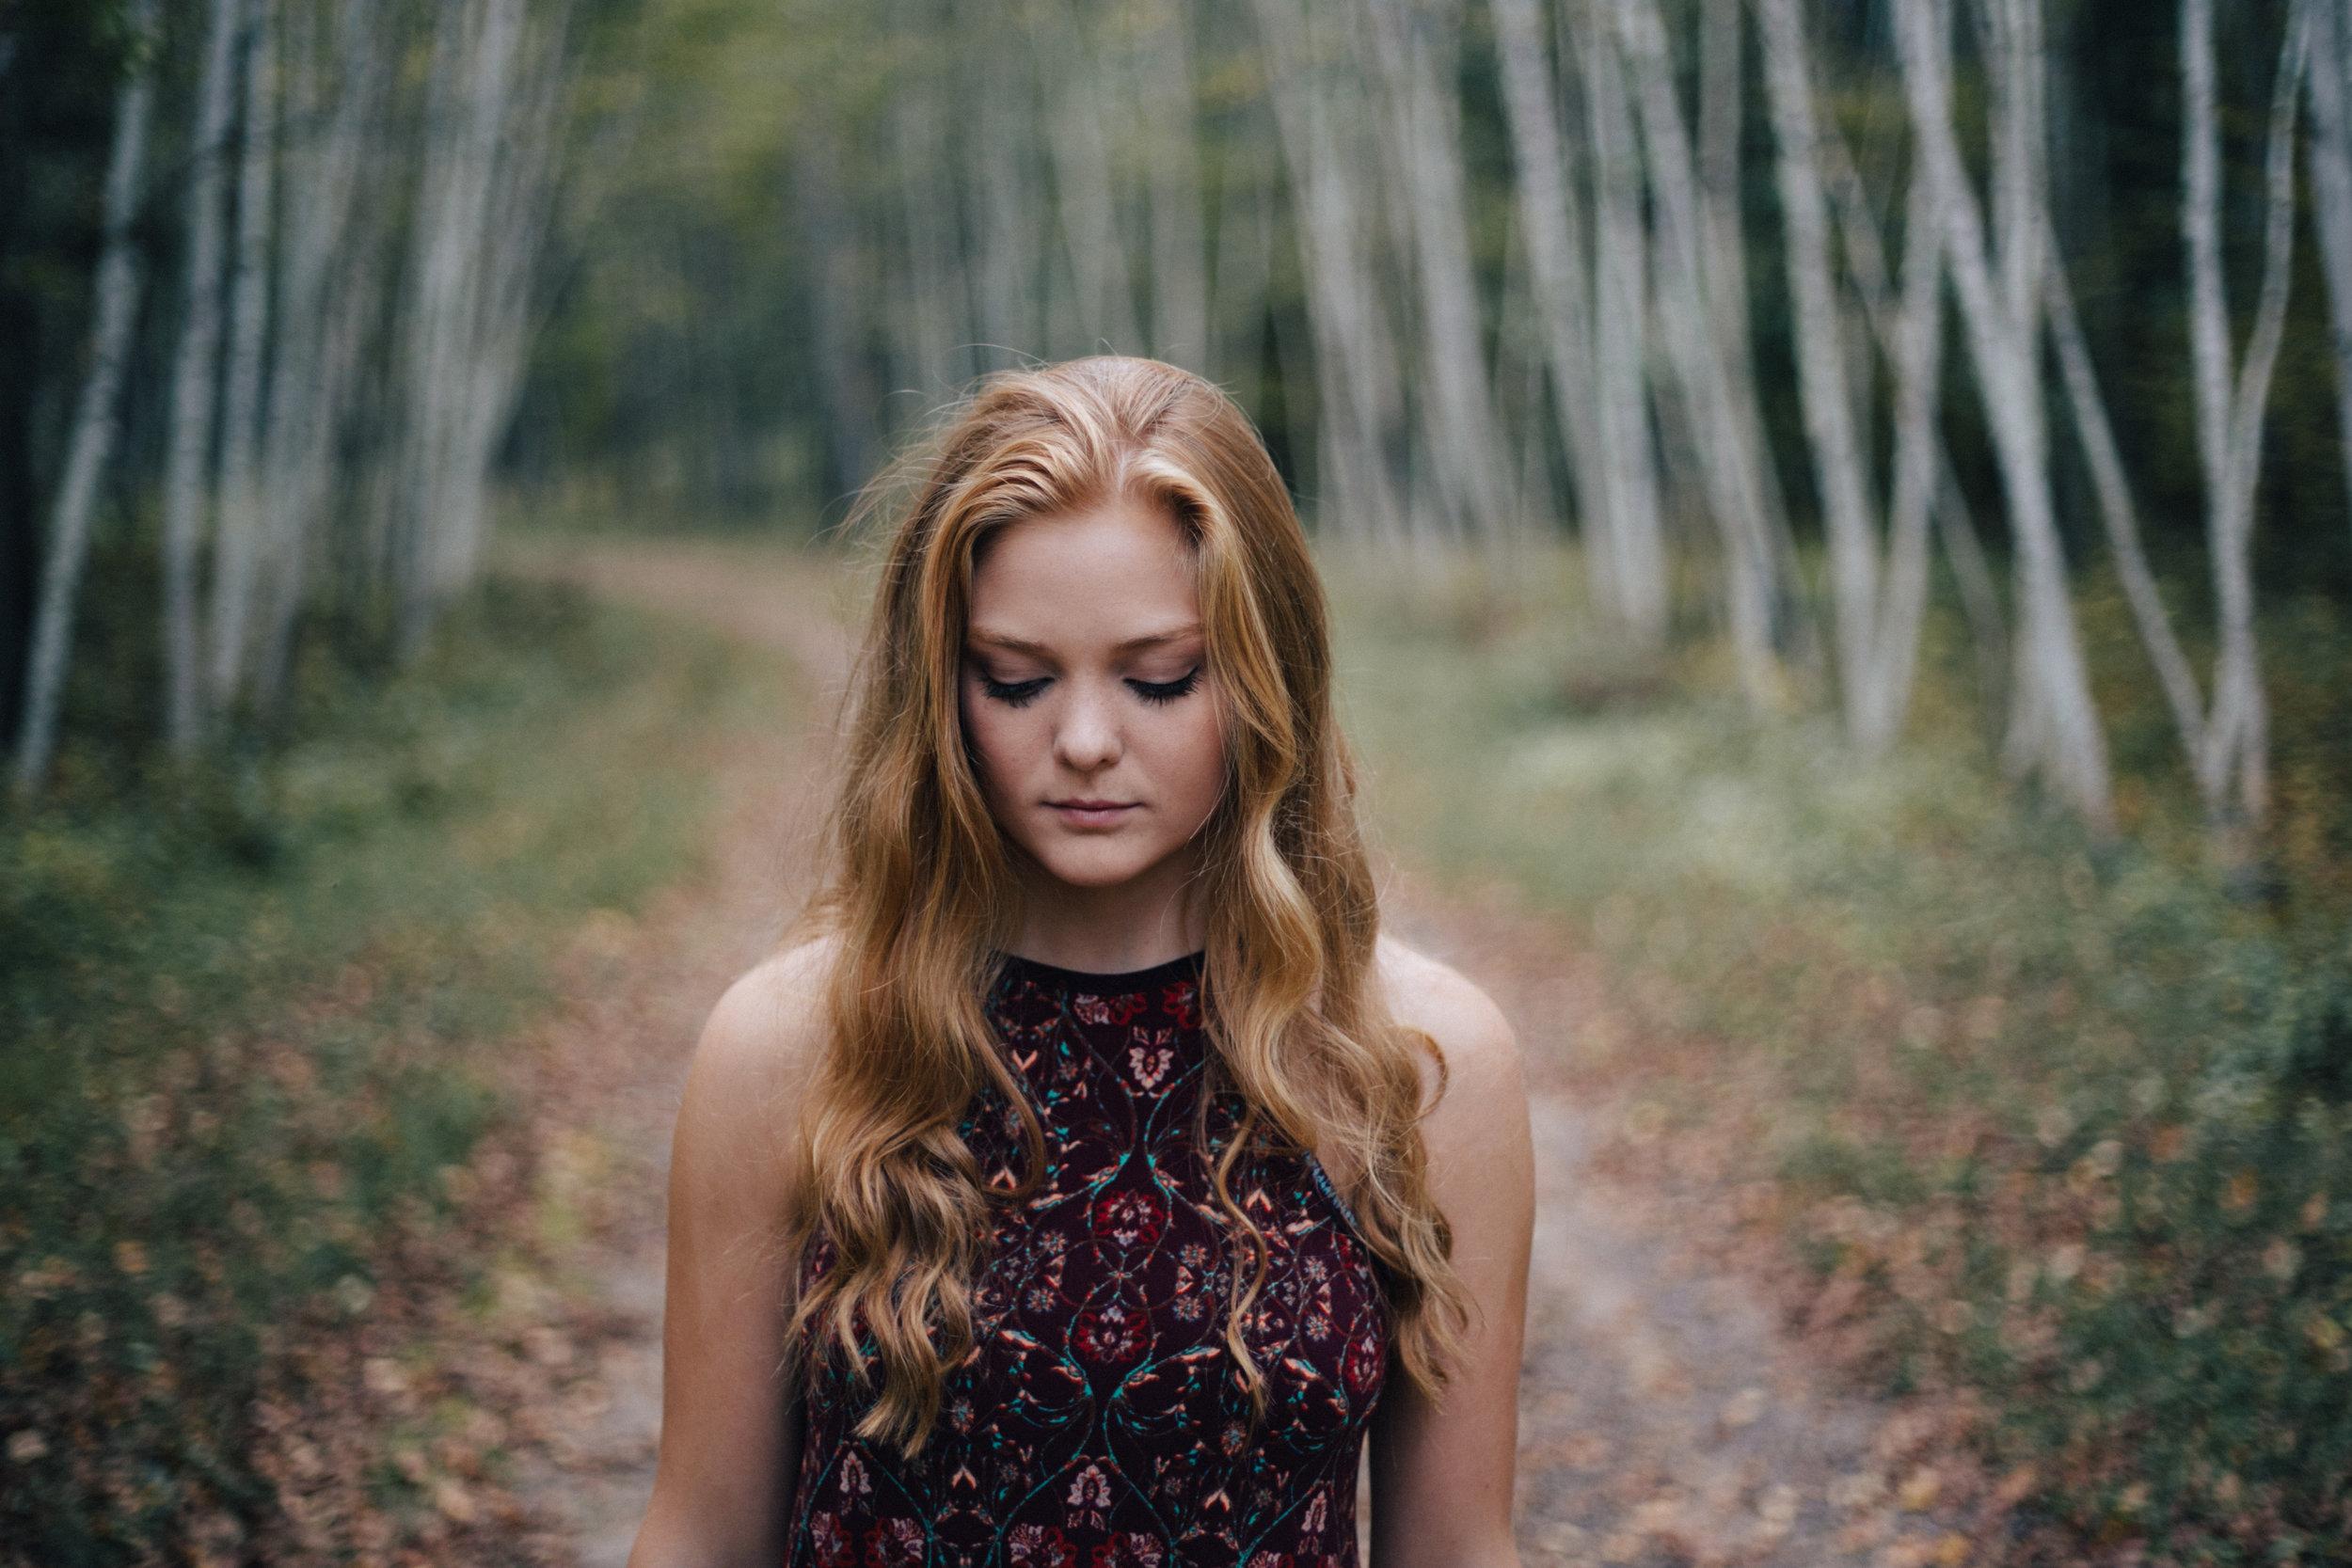 Modern high school senior portrait photography by Britt DeZeeuw, Brainerd Minnesota photographer